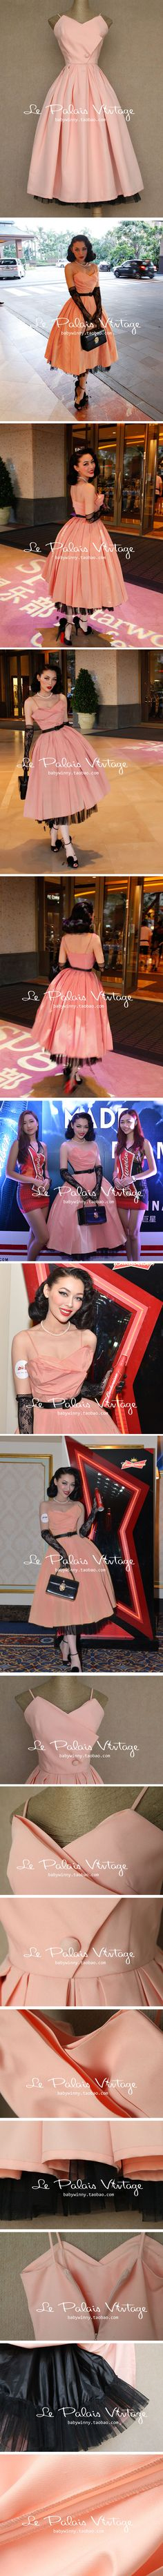 le palais vintage small number of elegant retro classic peach pink tutu dress straps 0.75kg-Taobao